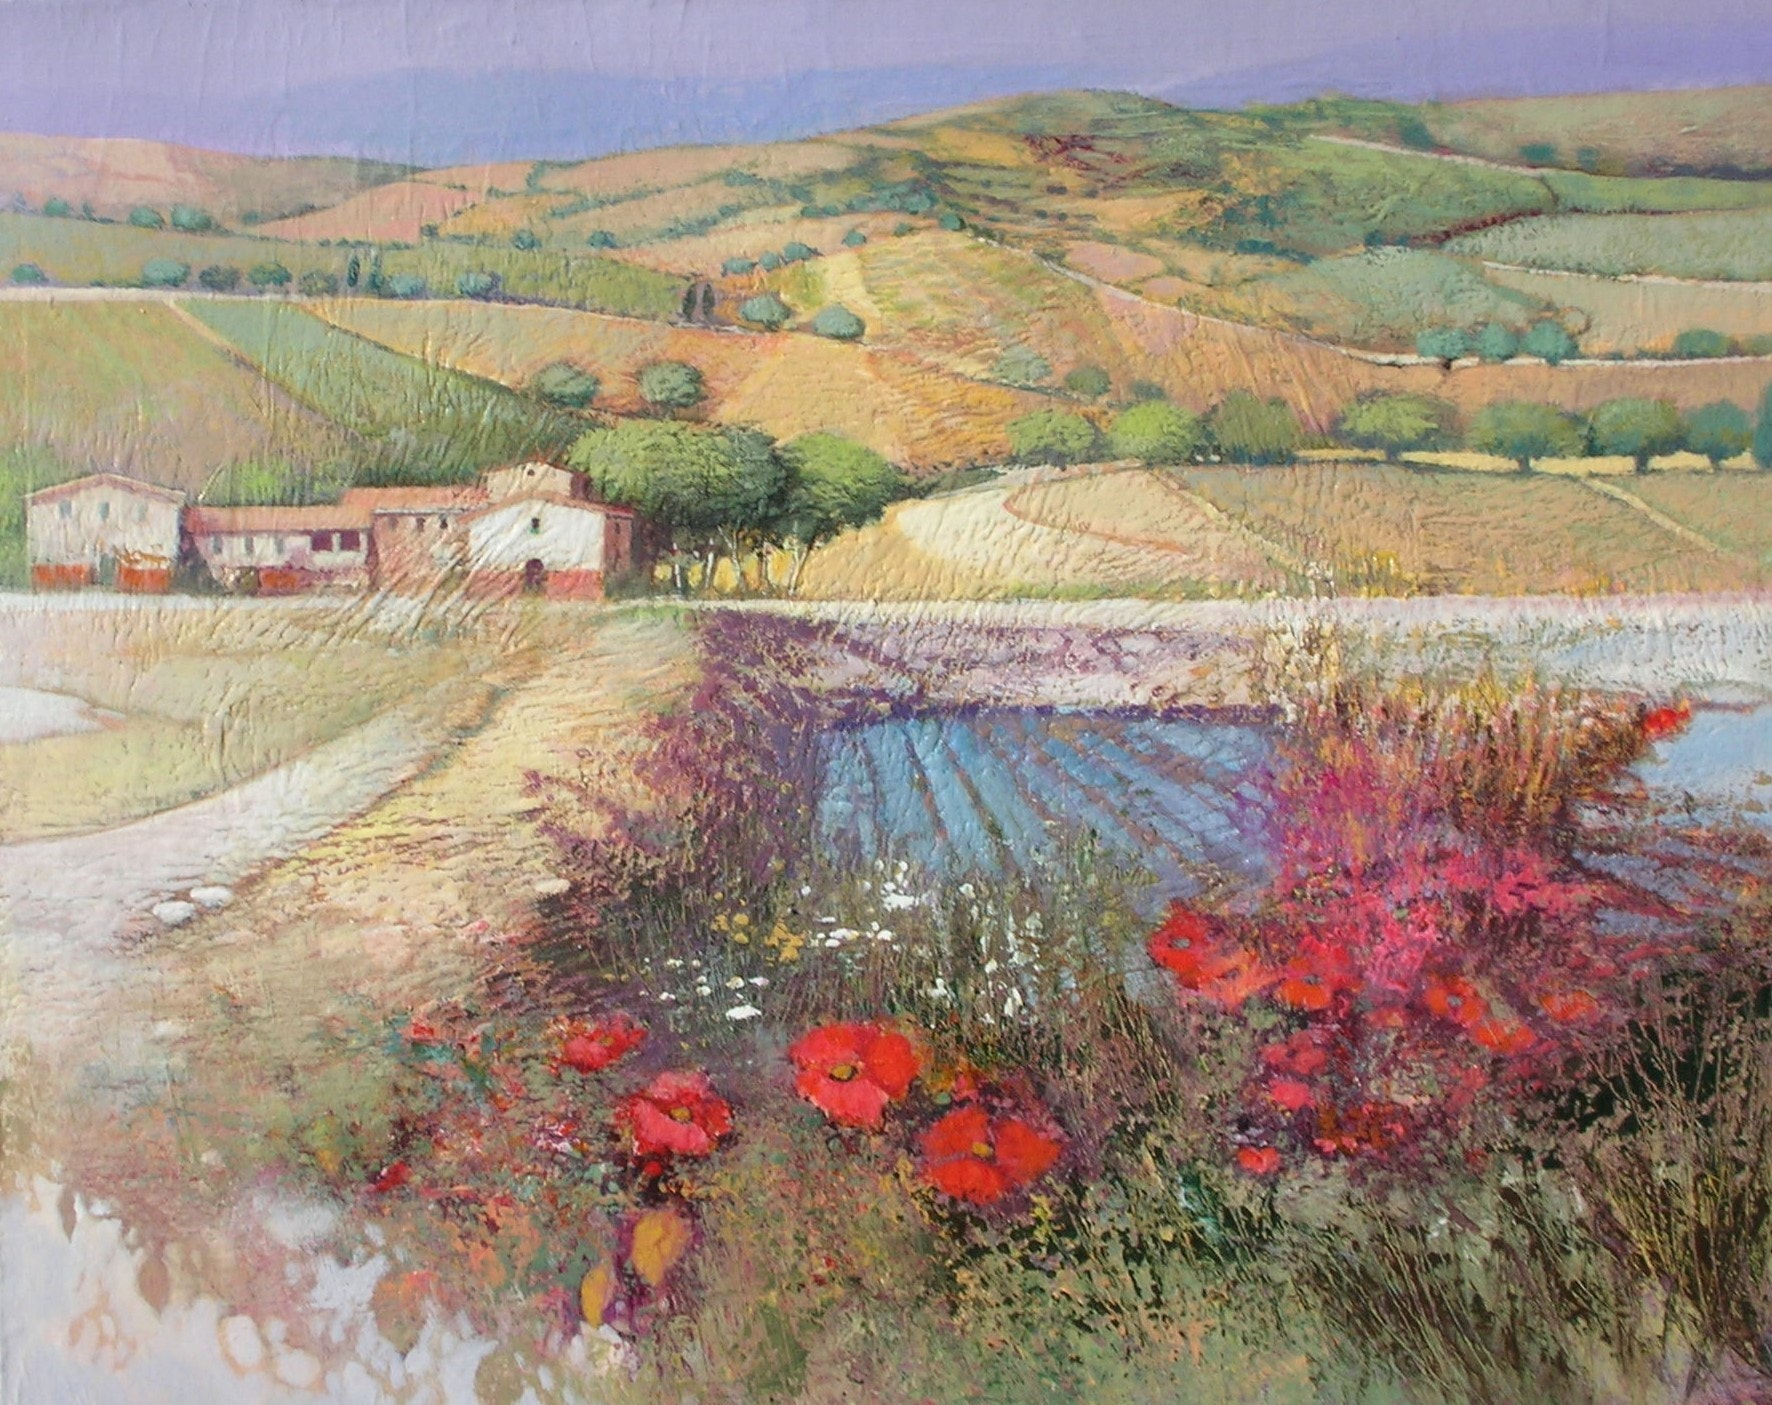 Nicola Paesaggio with Poppies 92x73